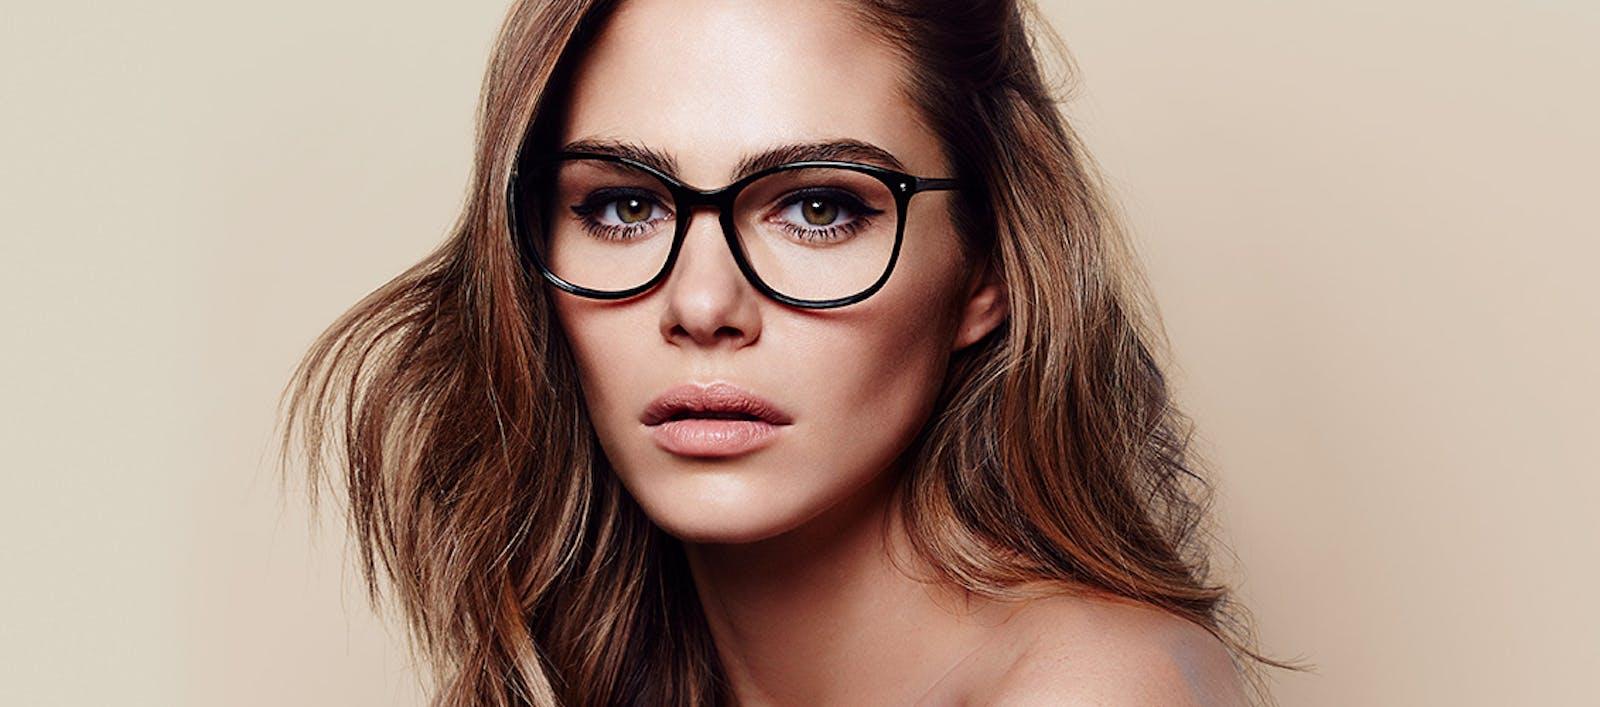 270903f33d Affordable Fashion Glasses Rectangle Square Round Sunglasses Women Nadine  Pitch Black